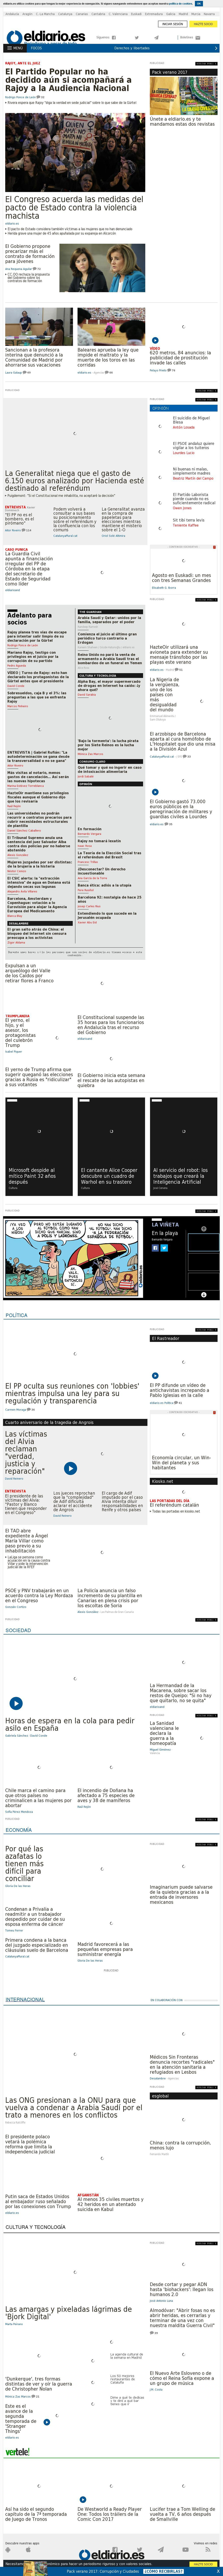 El Diario at Monday July 24, 2017, 9:04 p.m. UTC